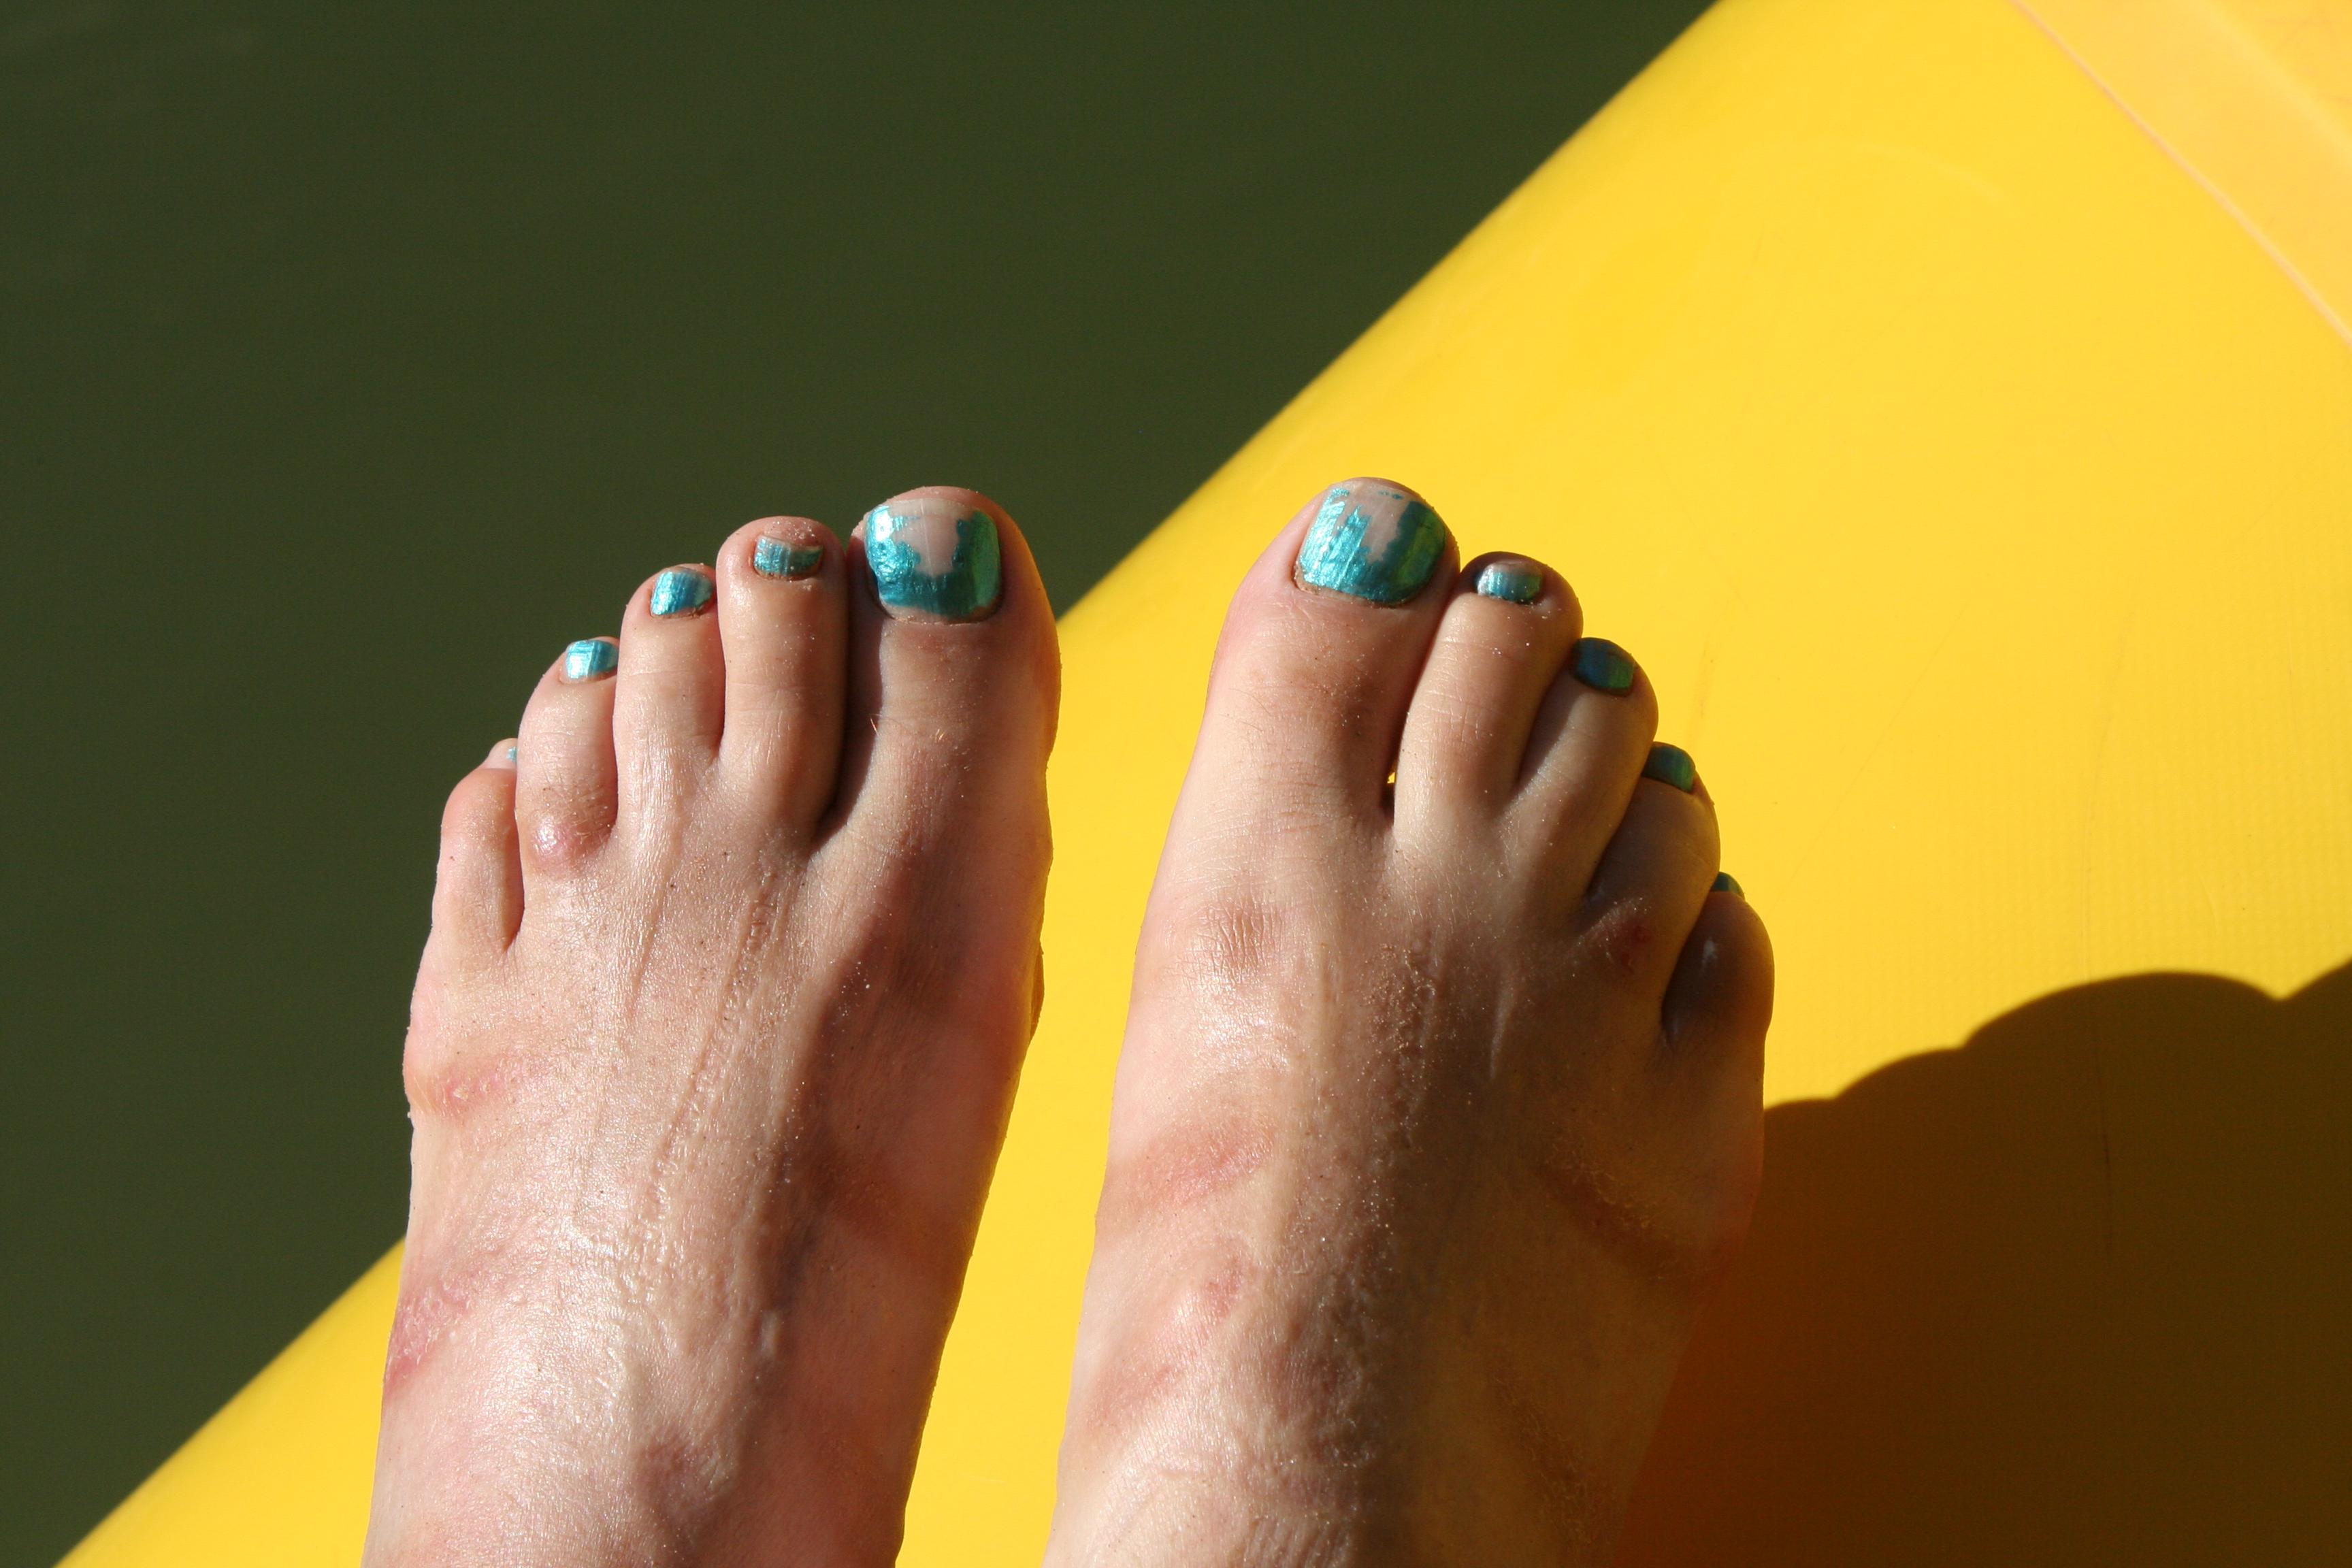 guys who paint their toenails